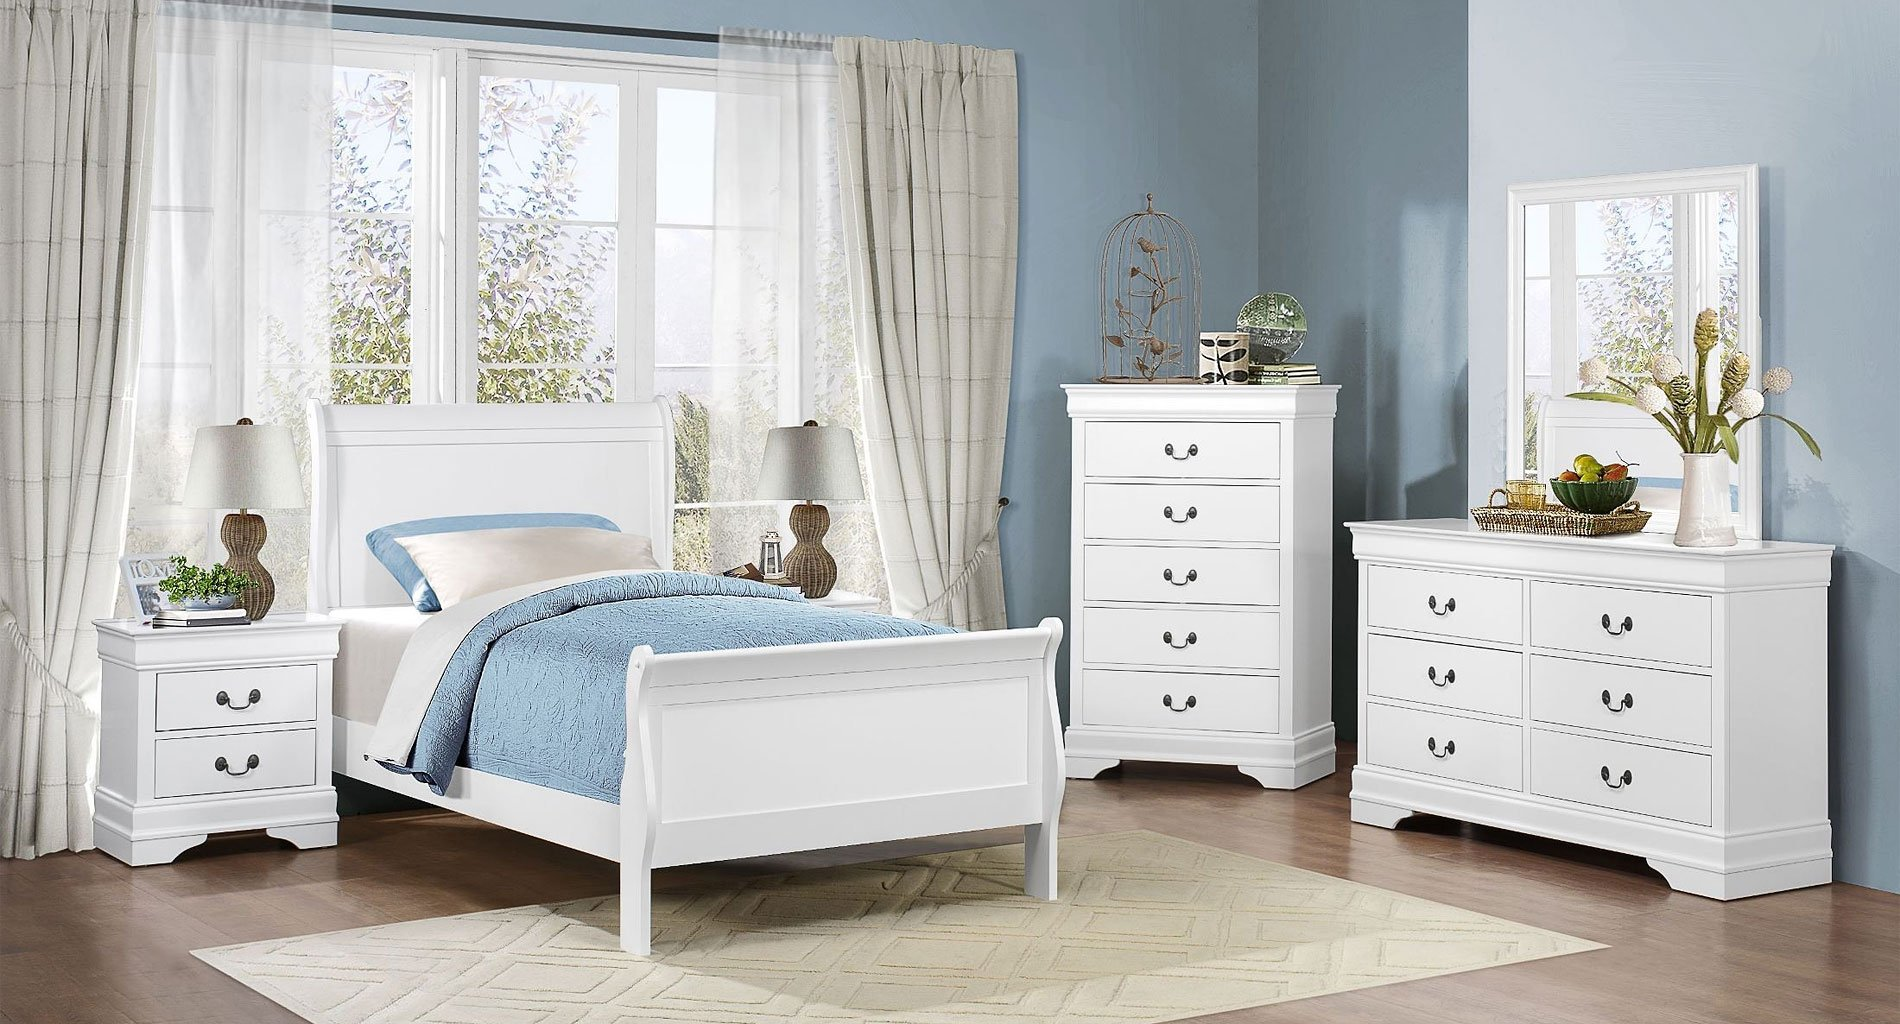 Mayville Youth Bedroom Set White Homelegance  Furniture